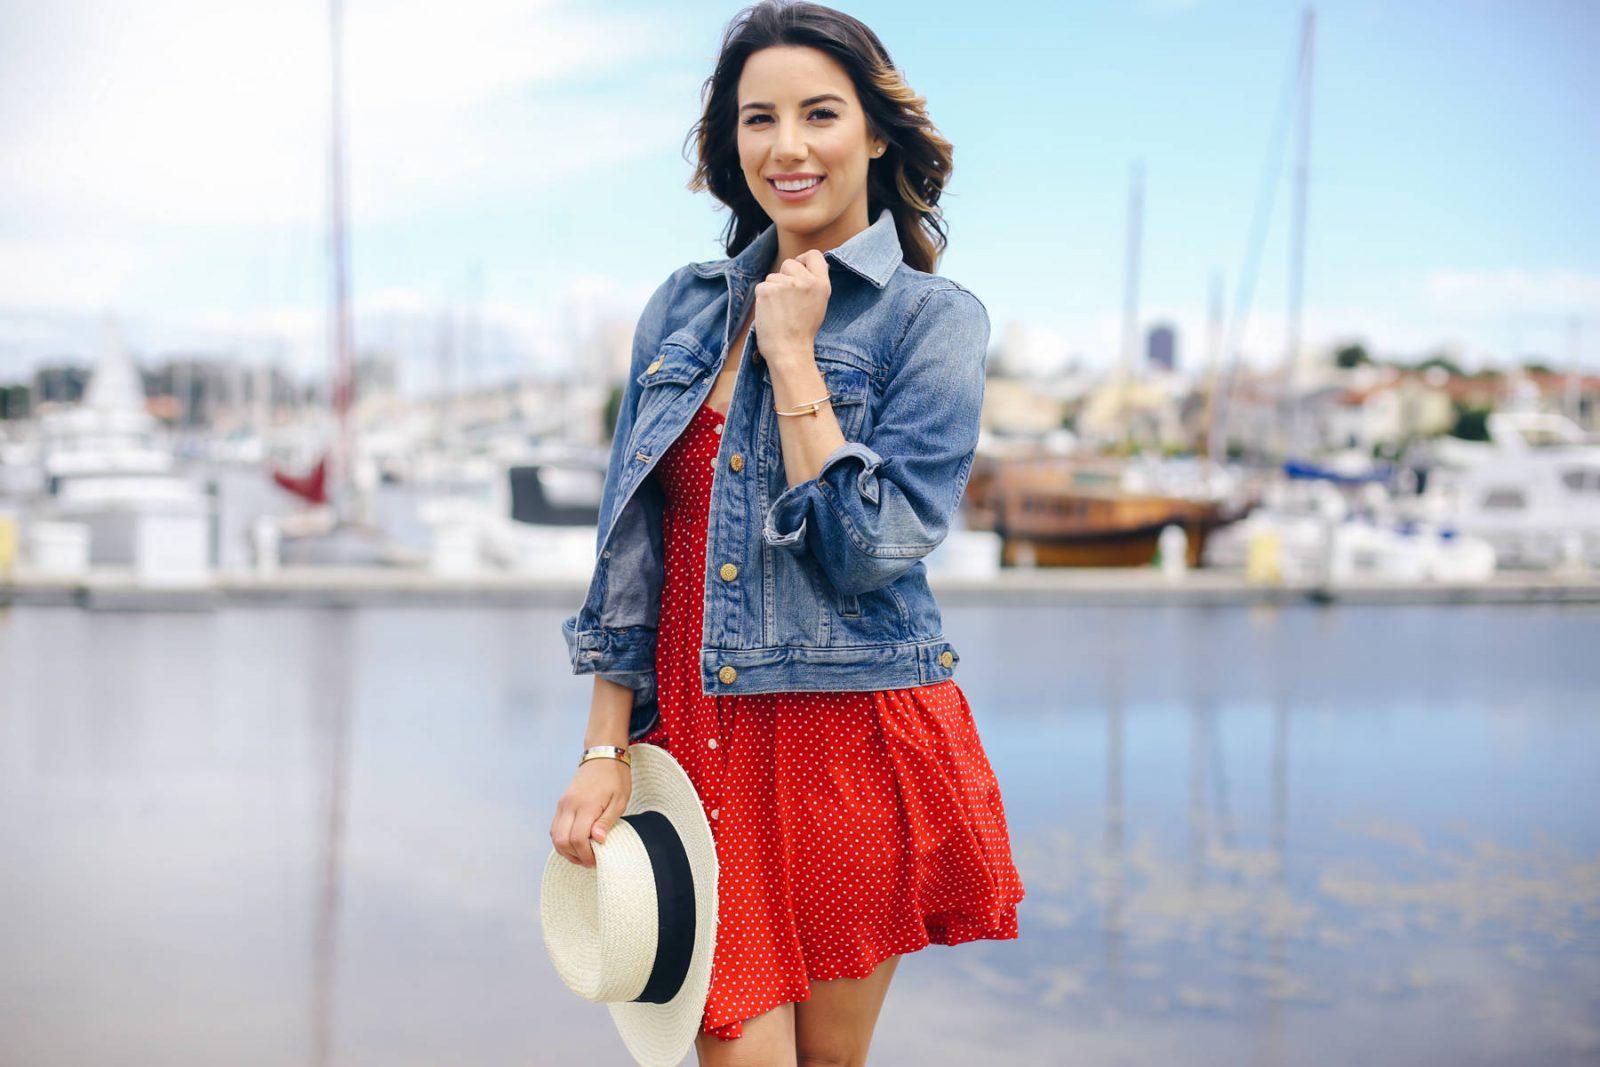 denim-jacket-red-dress-memorial-day-ariana-lauren-fashionborn-san-francisco-ryanbyryanchua-8850